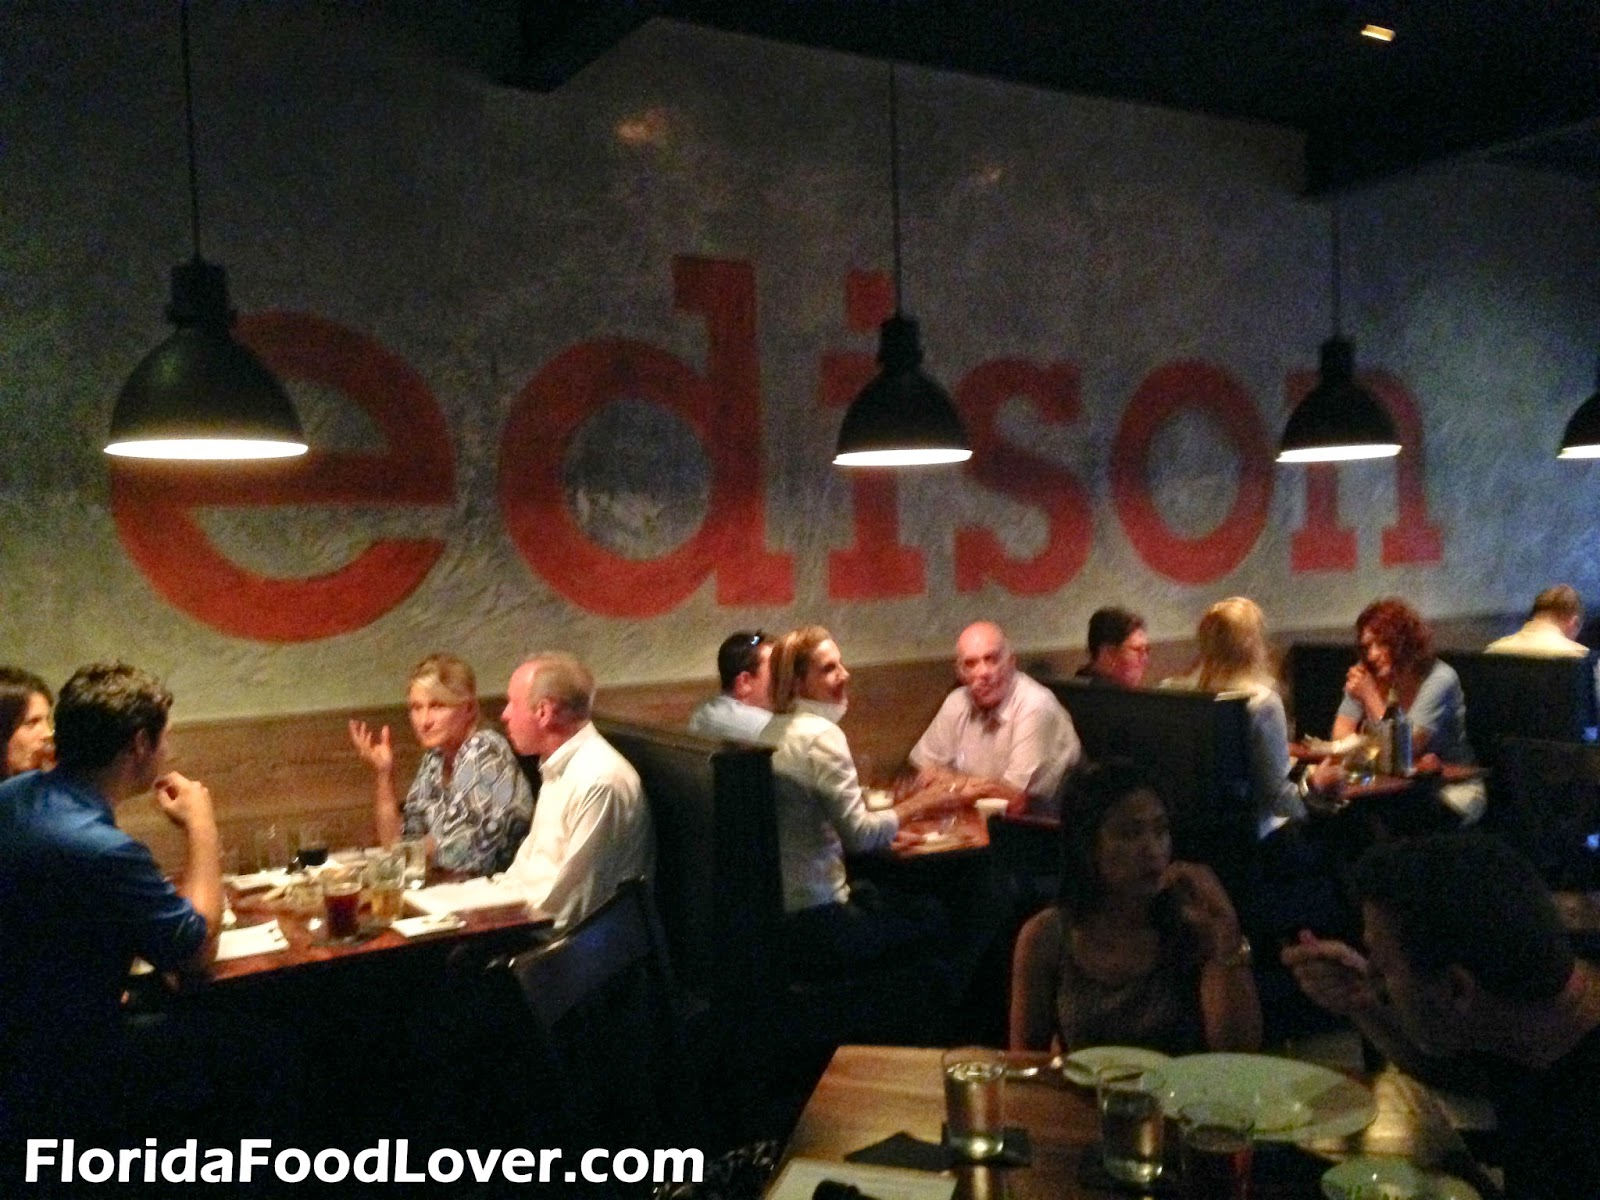 Florida Food Lover Edison Fooddrink Lab Tampa Fl